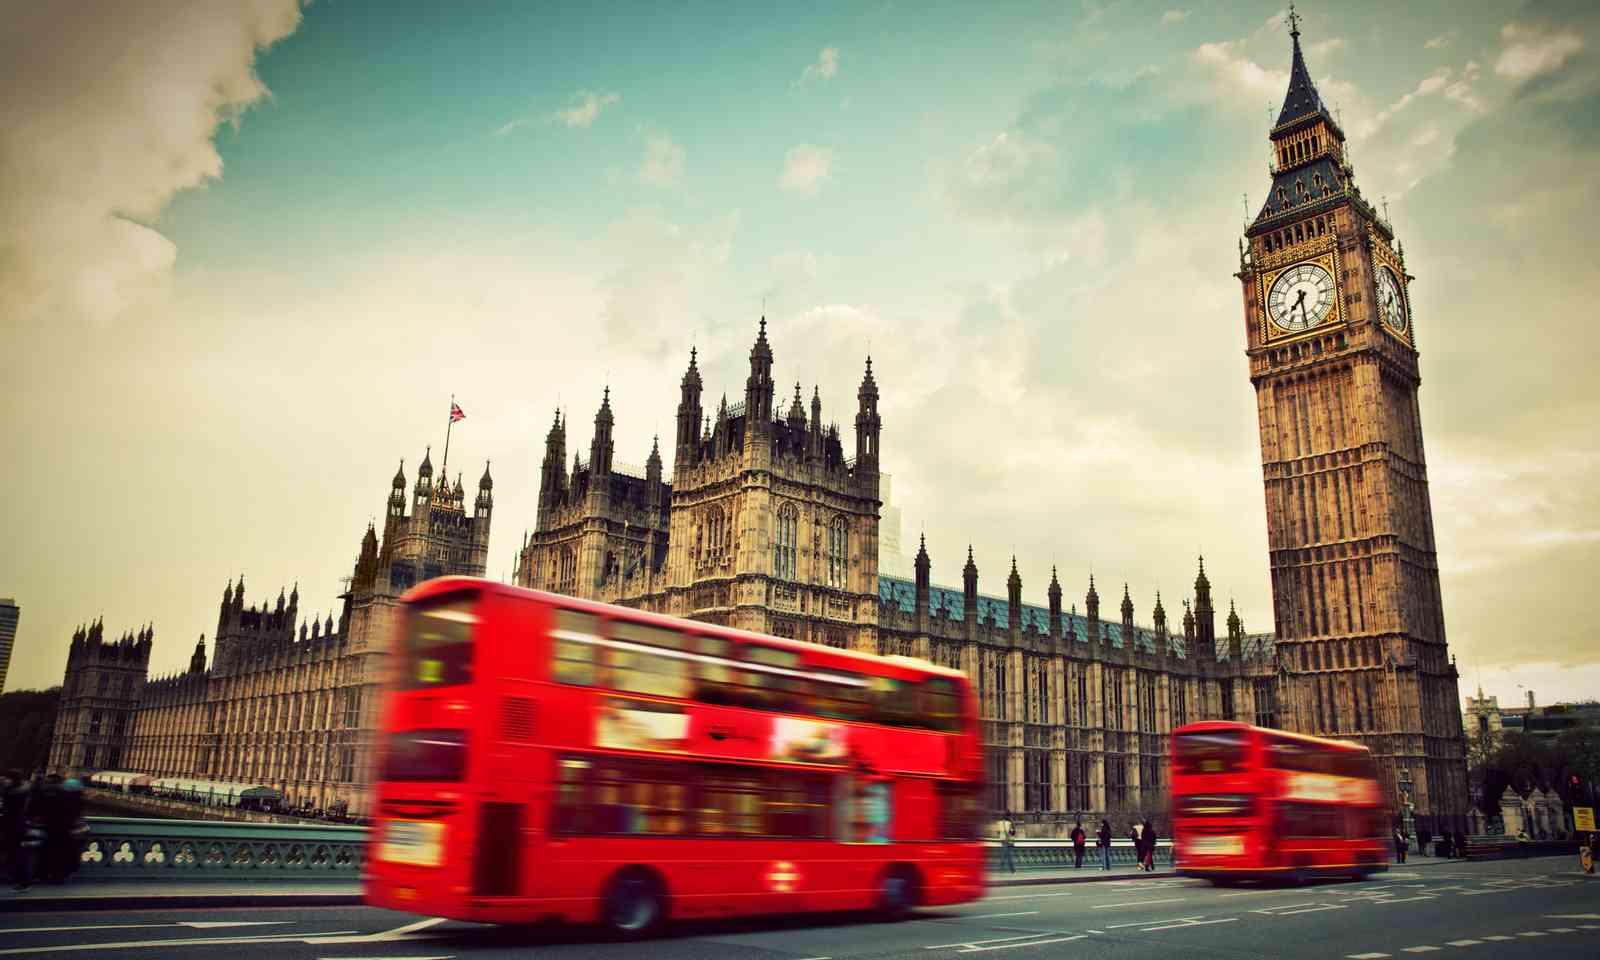 London Icons (Shutterstock.com)